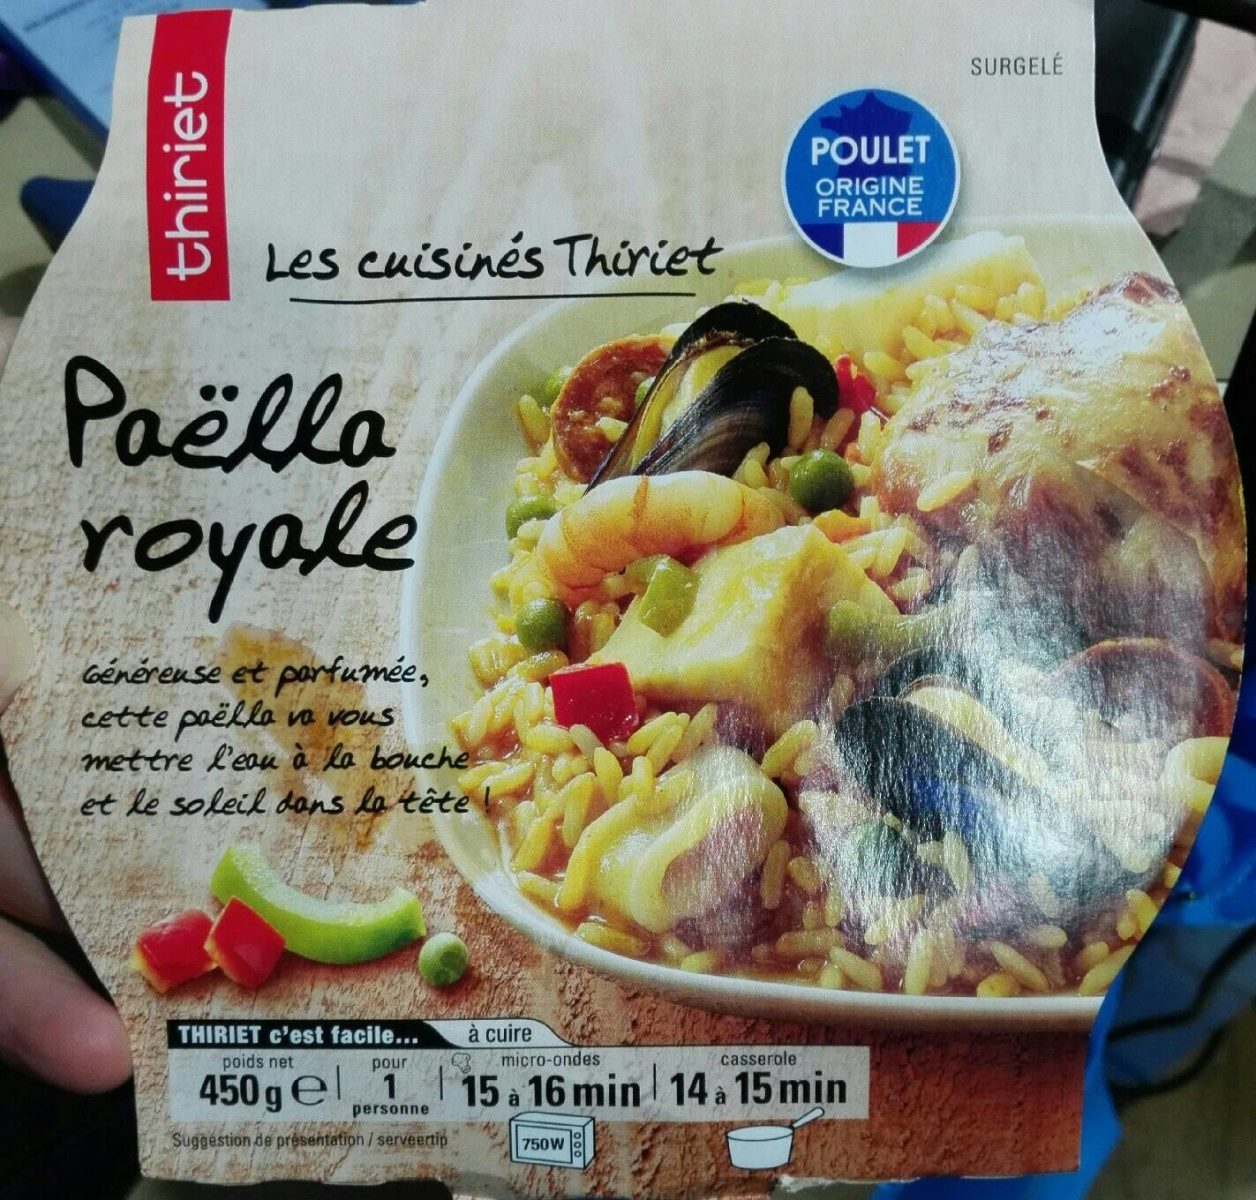 Paella Royale Thiriet 450 G E